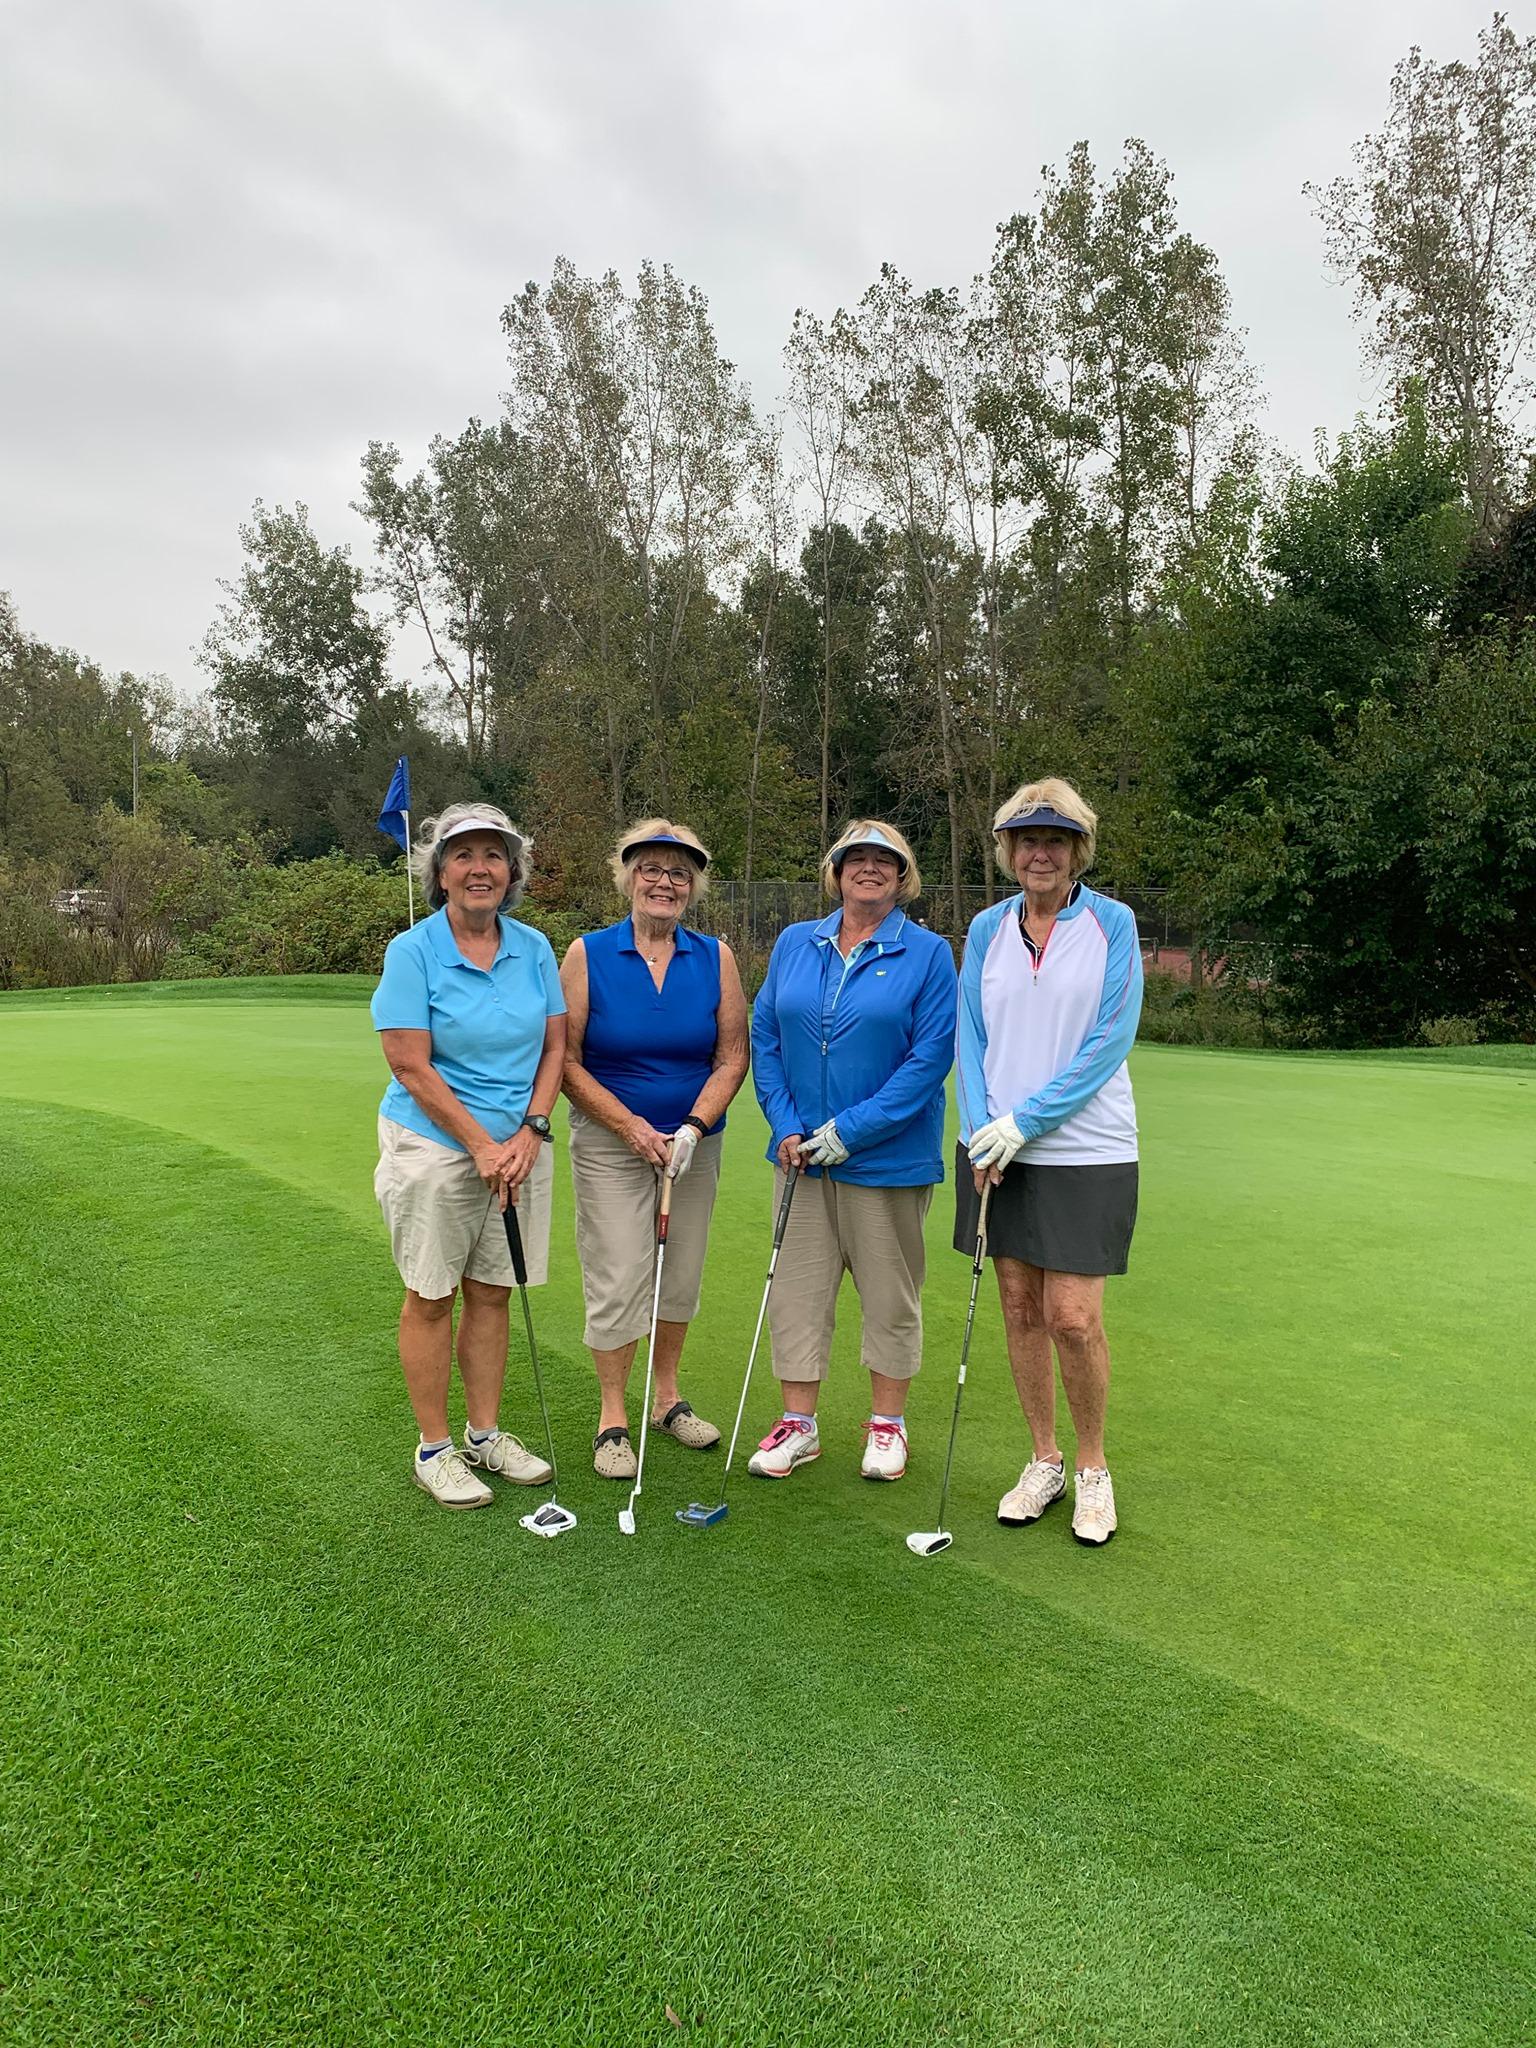 SACC-Golf-Outing-2021-Sub-Par-Ladies.jpg